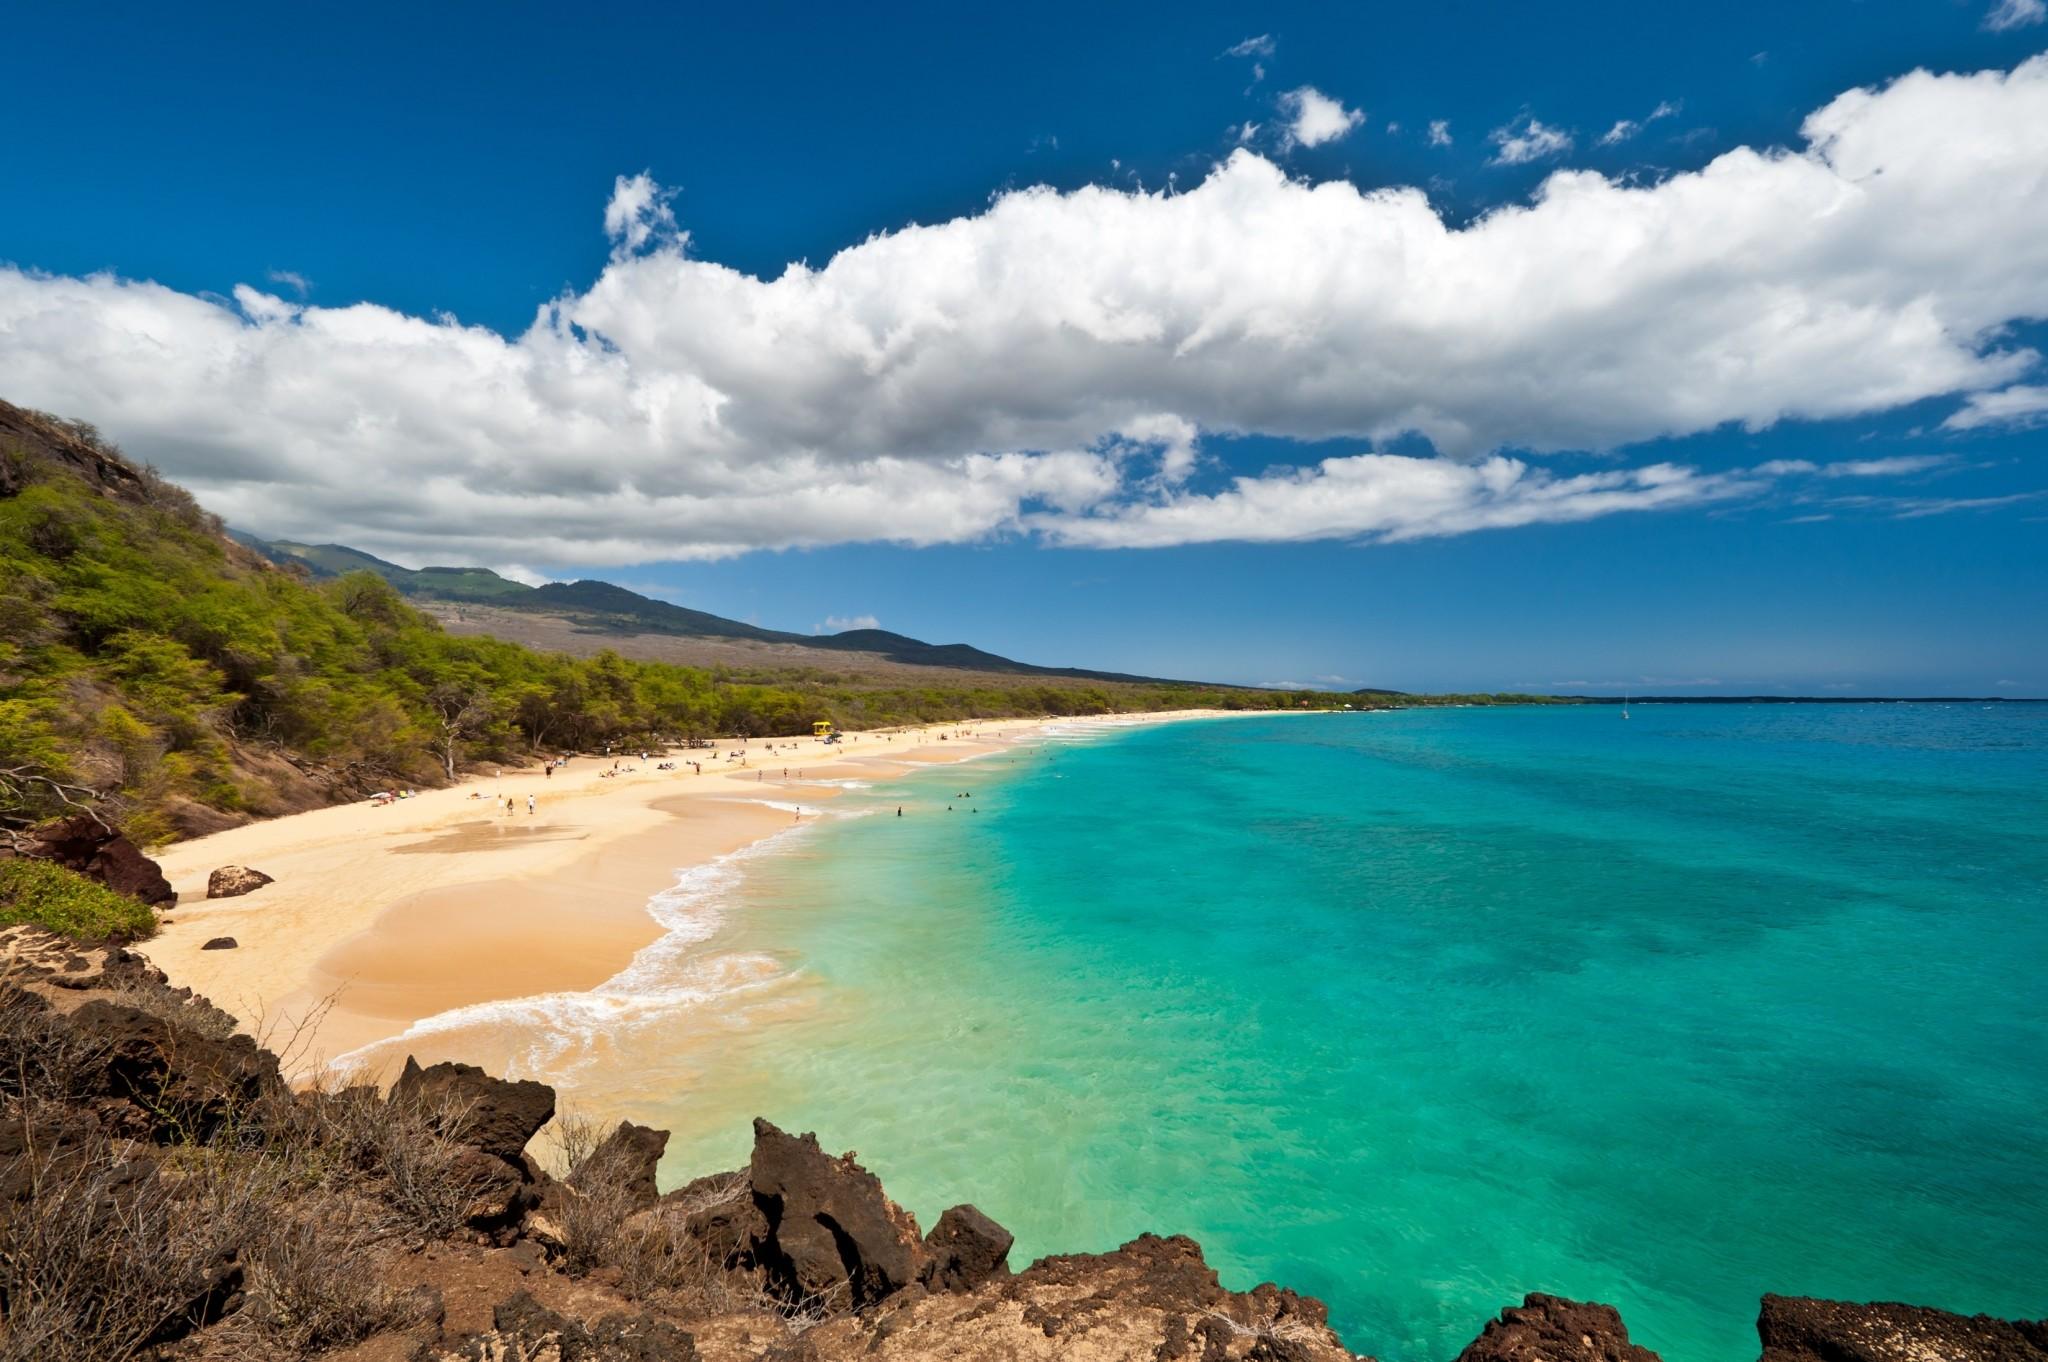 hawaii wallpaper free desktop wallpapers